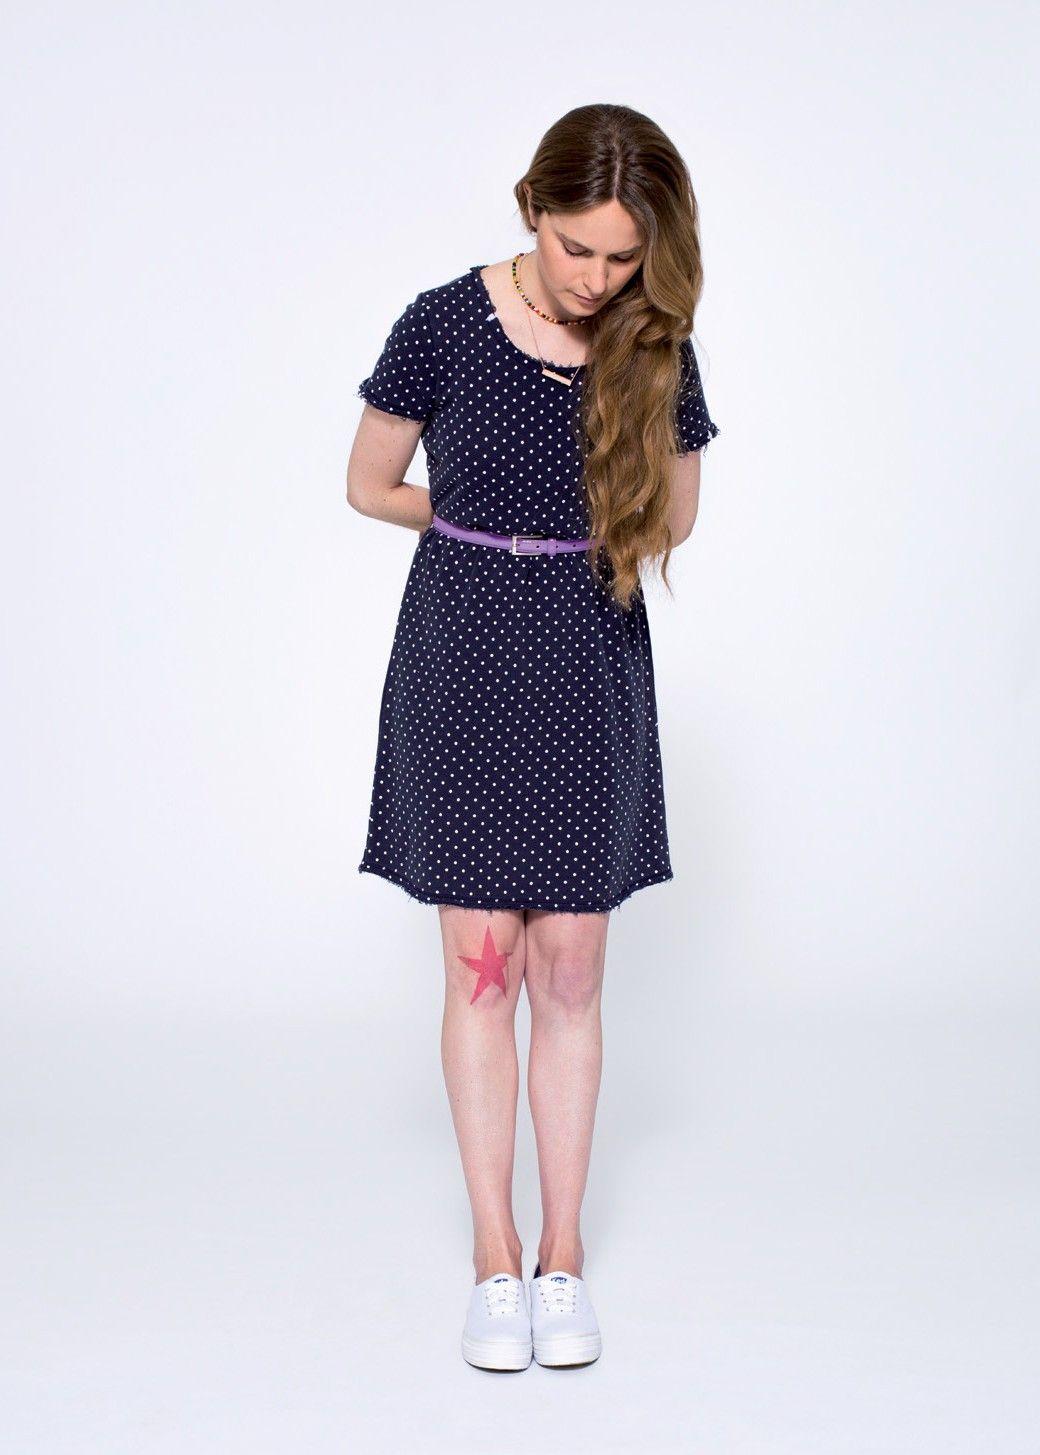 A blue dress with little polka dots, simply chic! SUN68 Woman SS15 #SUN68 #SS15 #woman #dress #polkadots